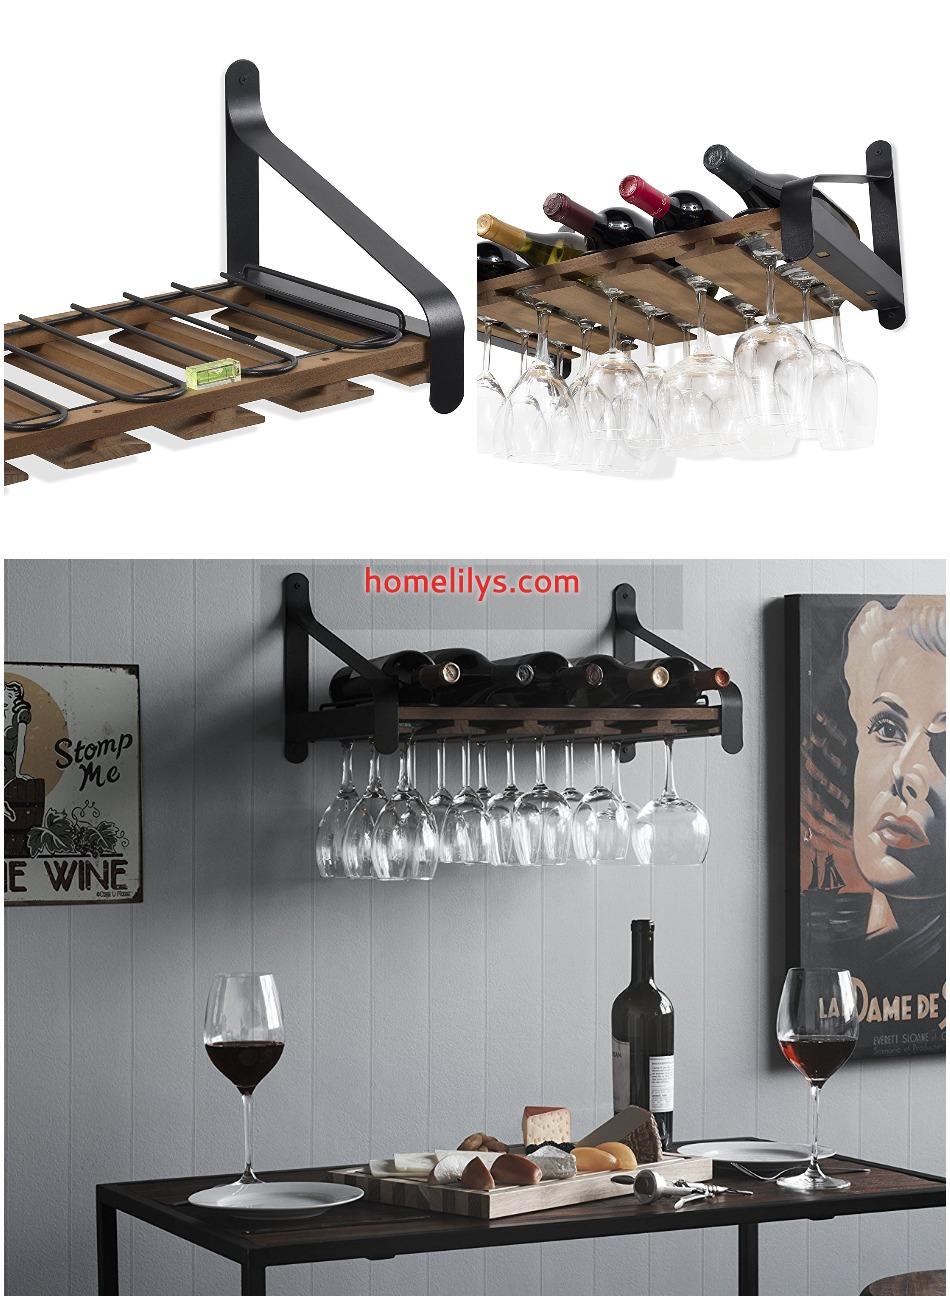 rustic wooden wine rack with Stemware Racks Organizer Walnut Stained